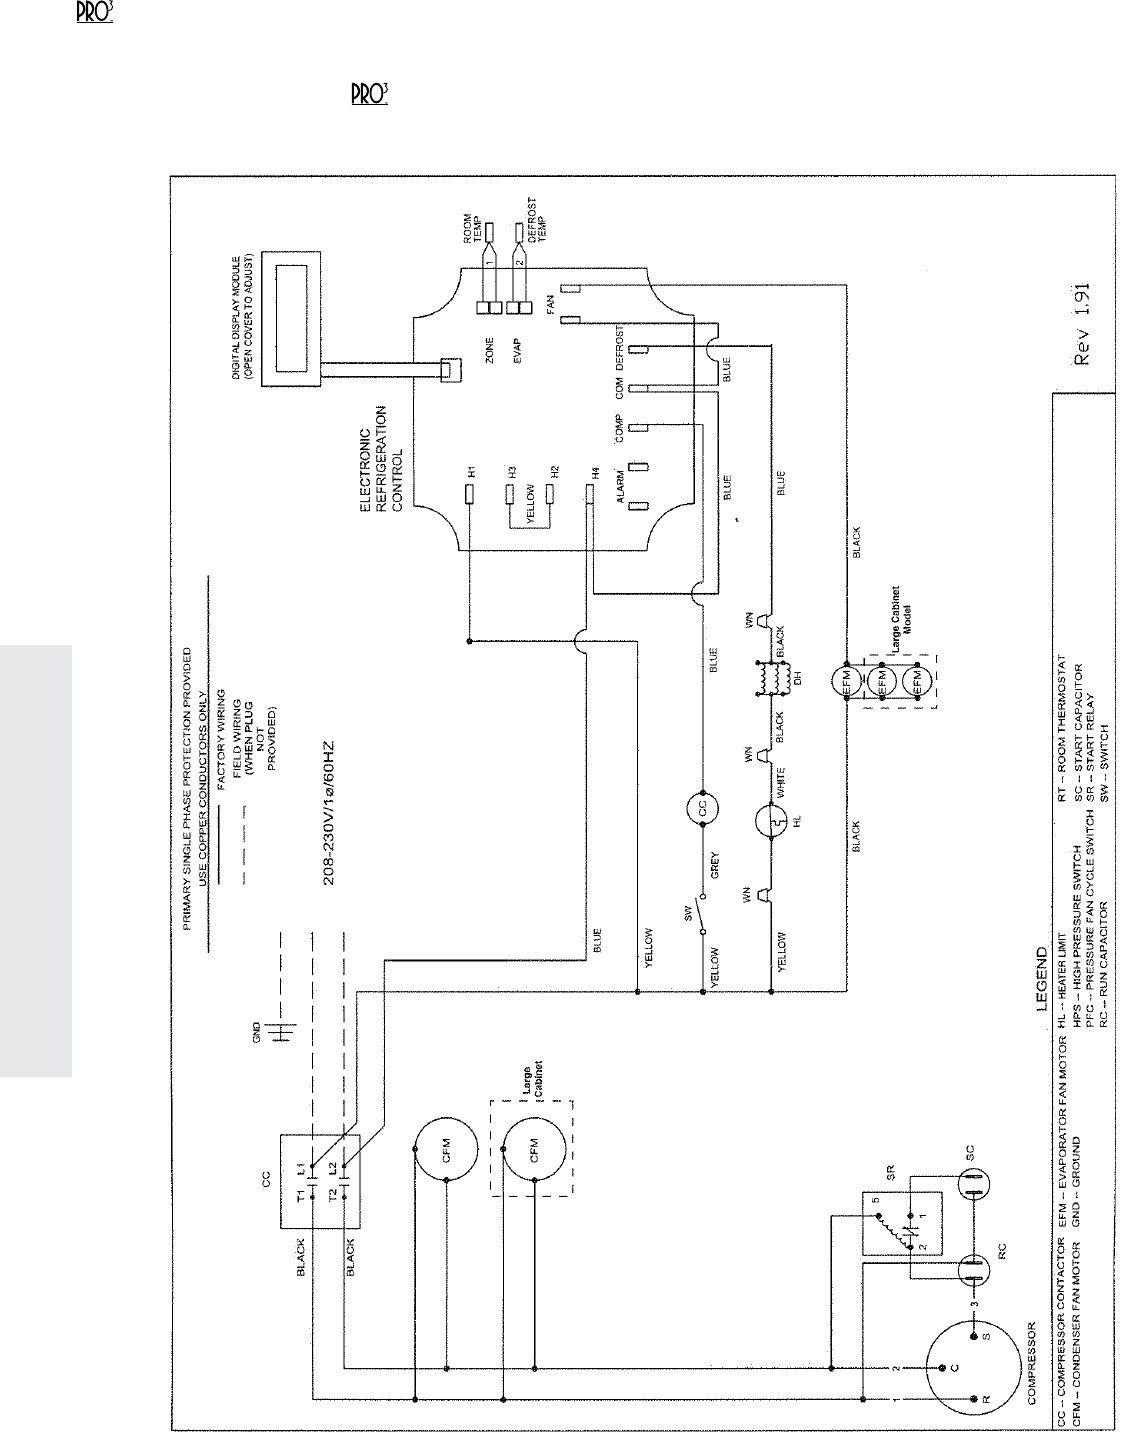 heatcraft evaporator wiring diagram 220 library of wiring diagram in heatcraft evaporator wiring diagram [ 1131 x 1444 Pixel ]